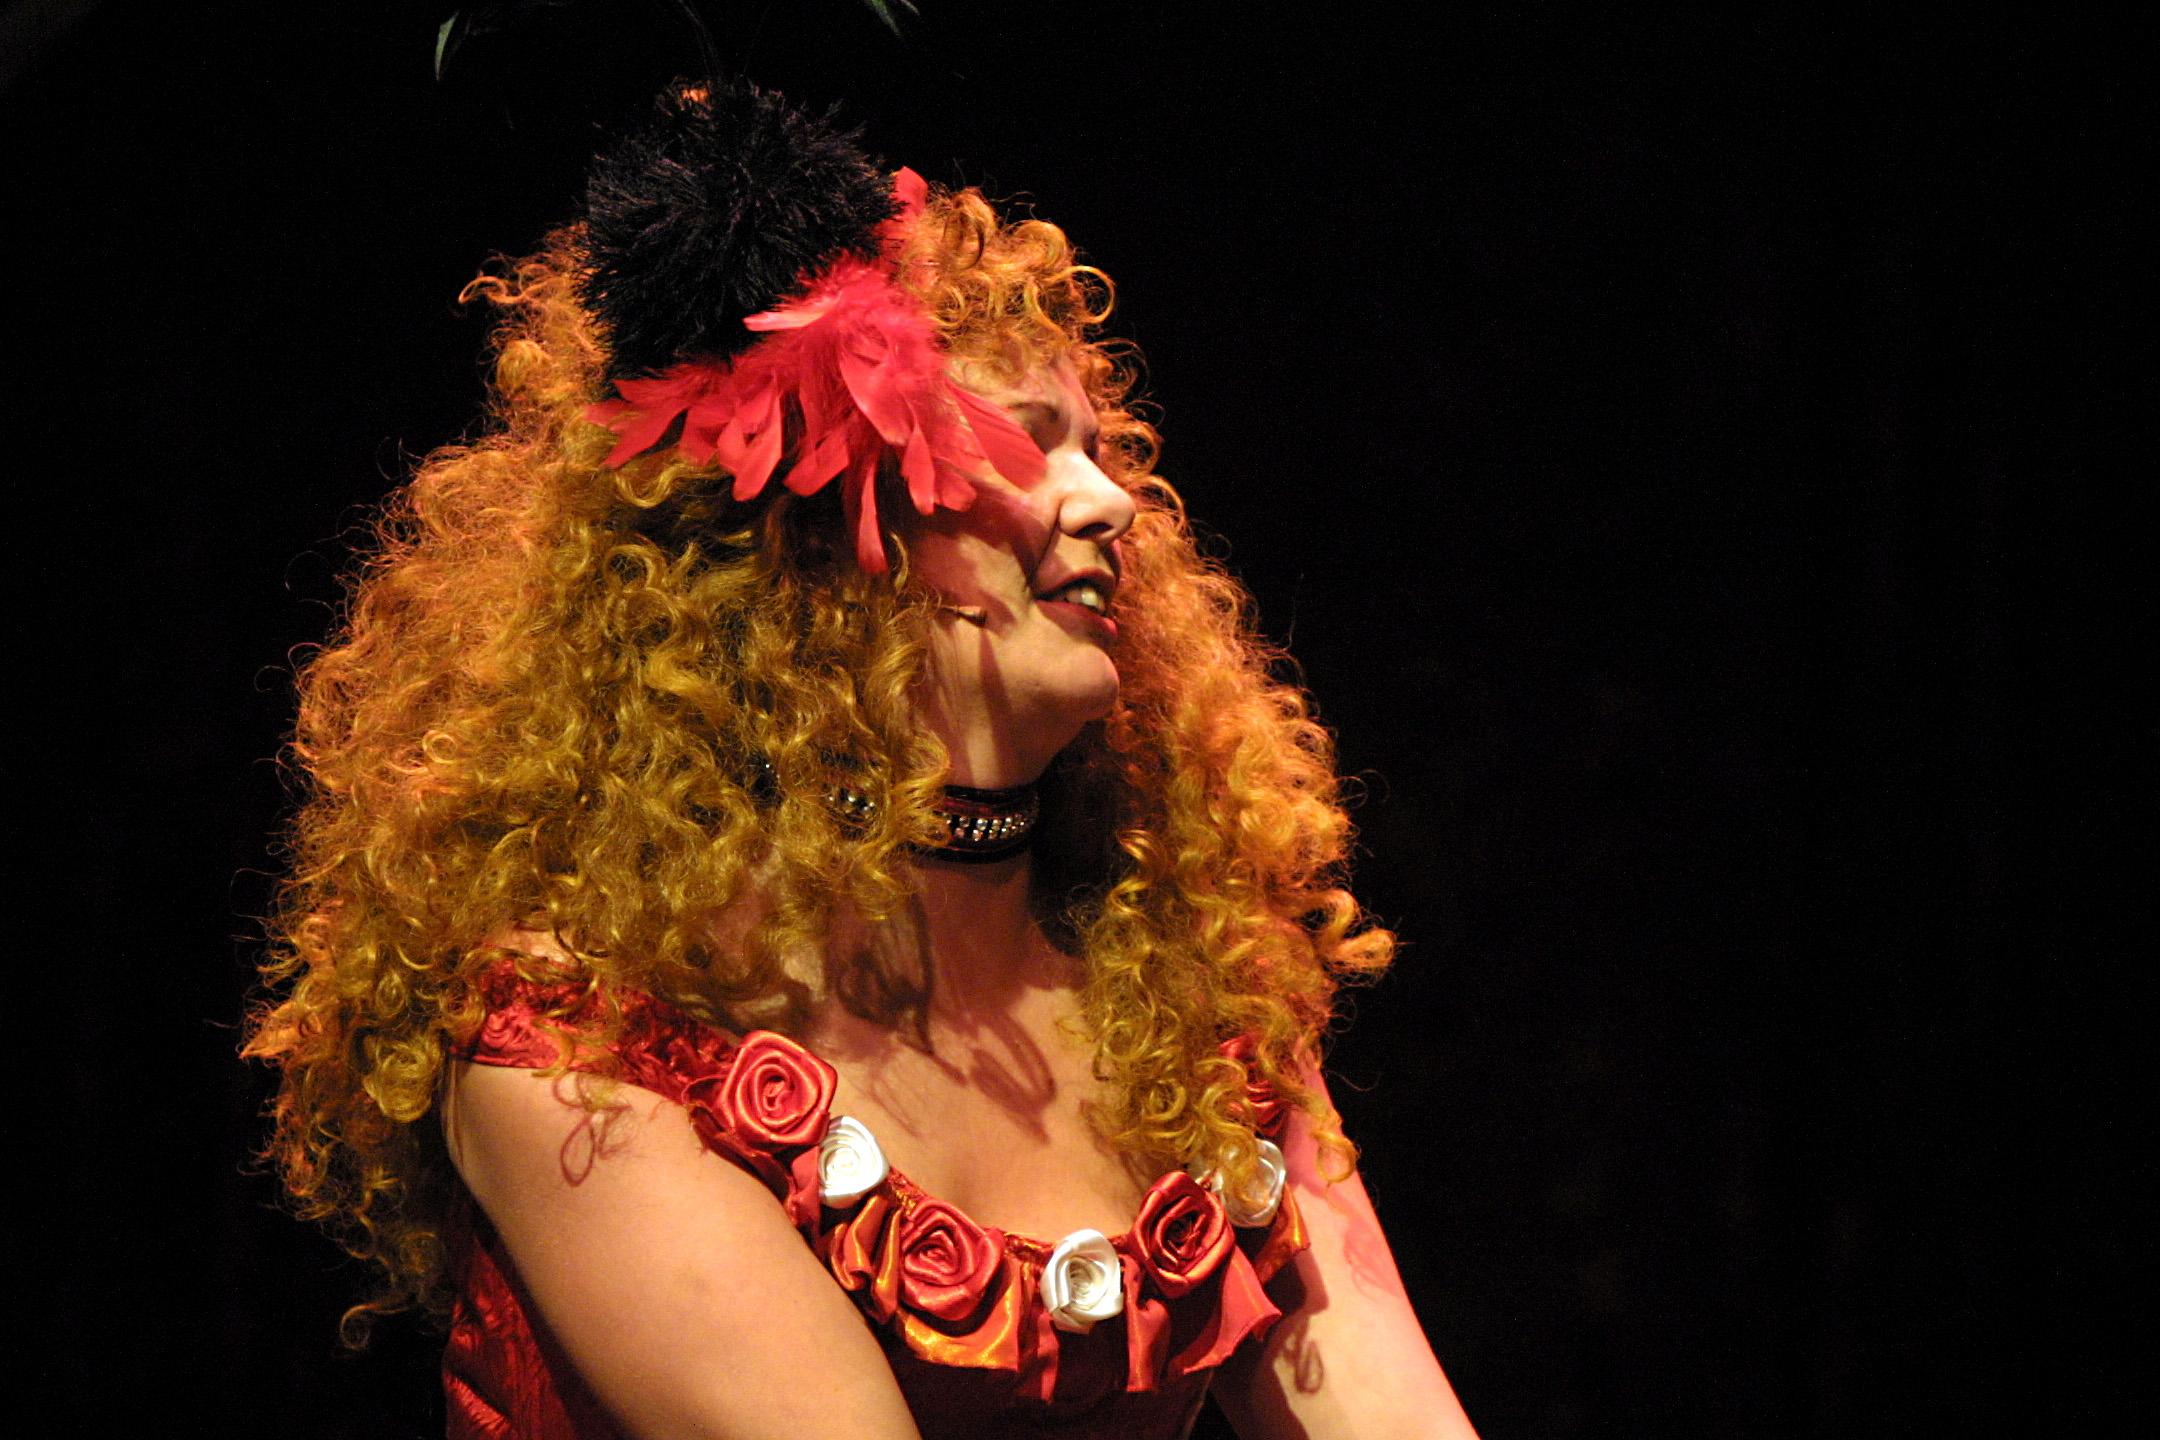 049 - The Scarlet Pimpernel 2005 - Generale.jpg